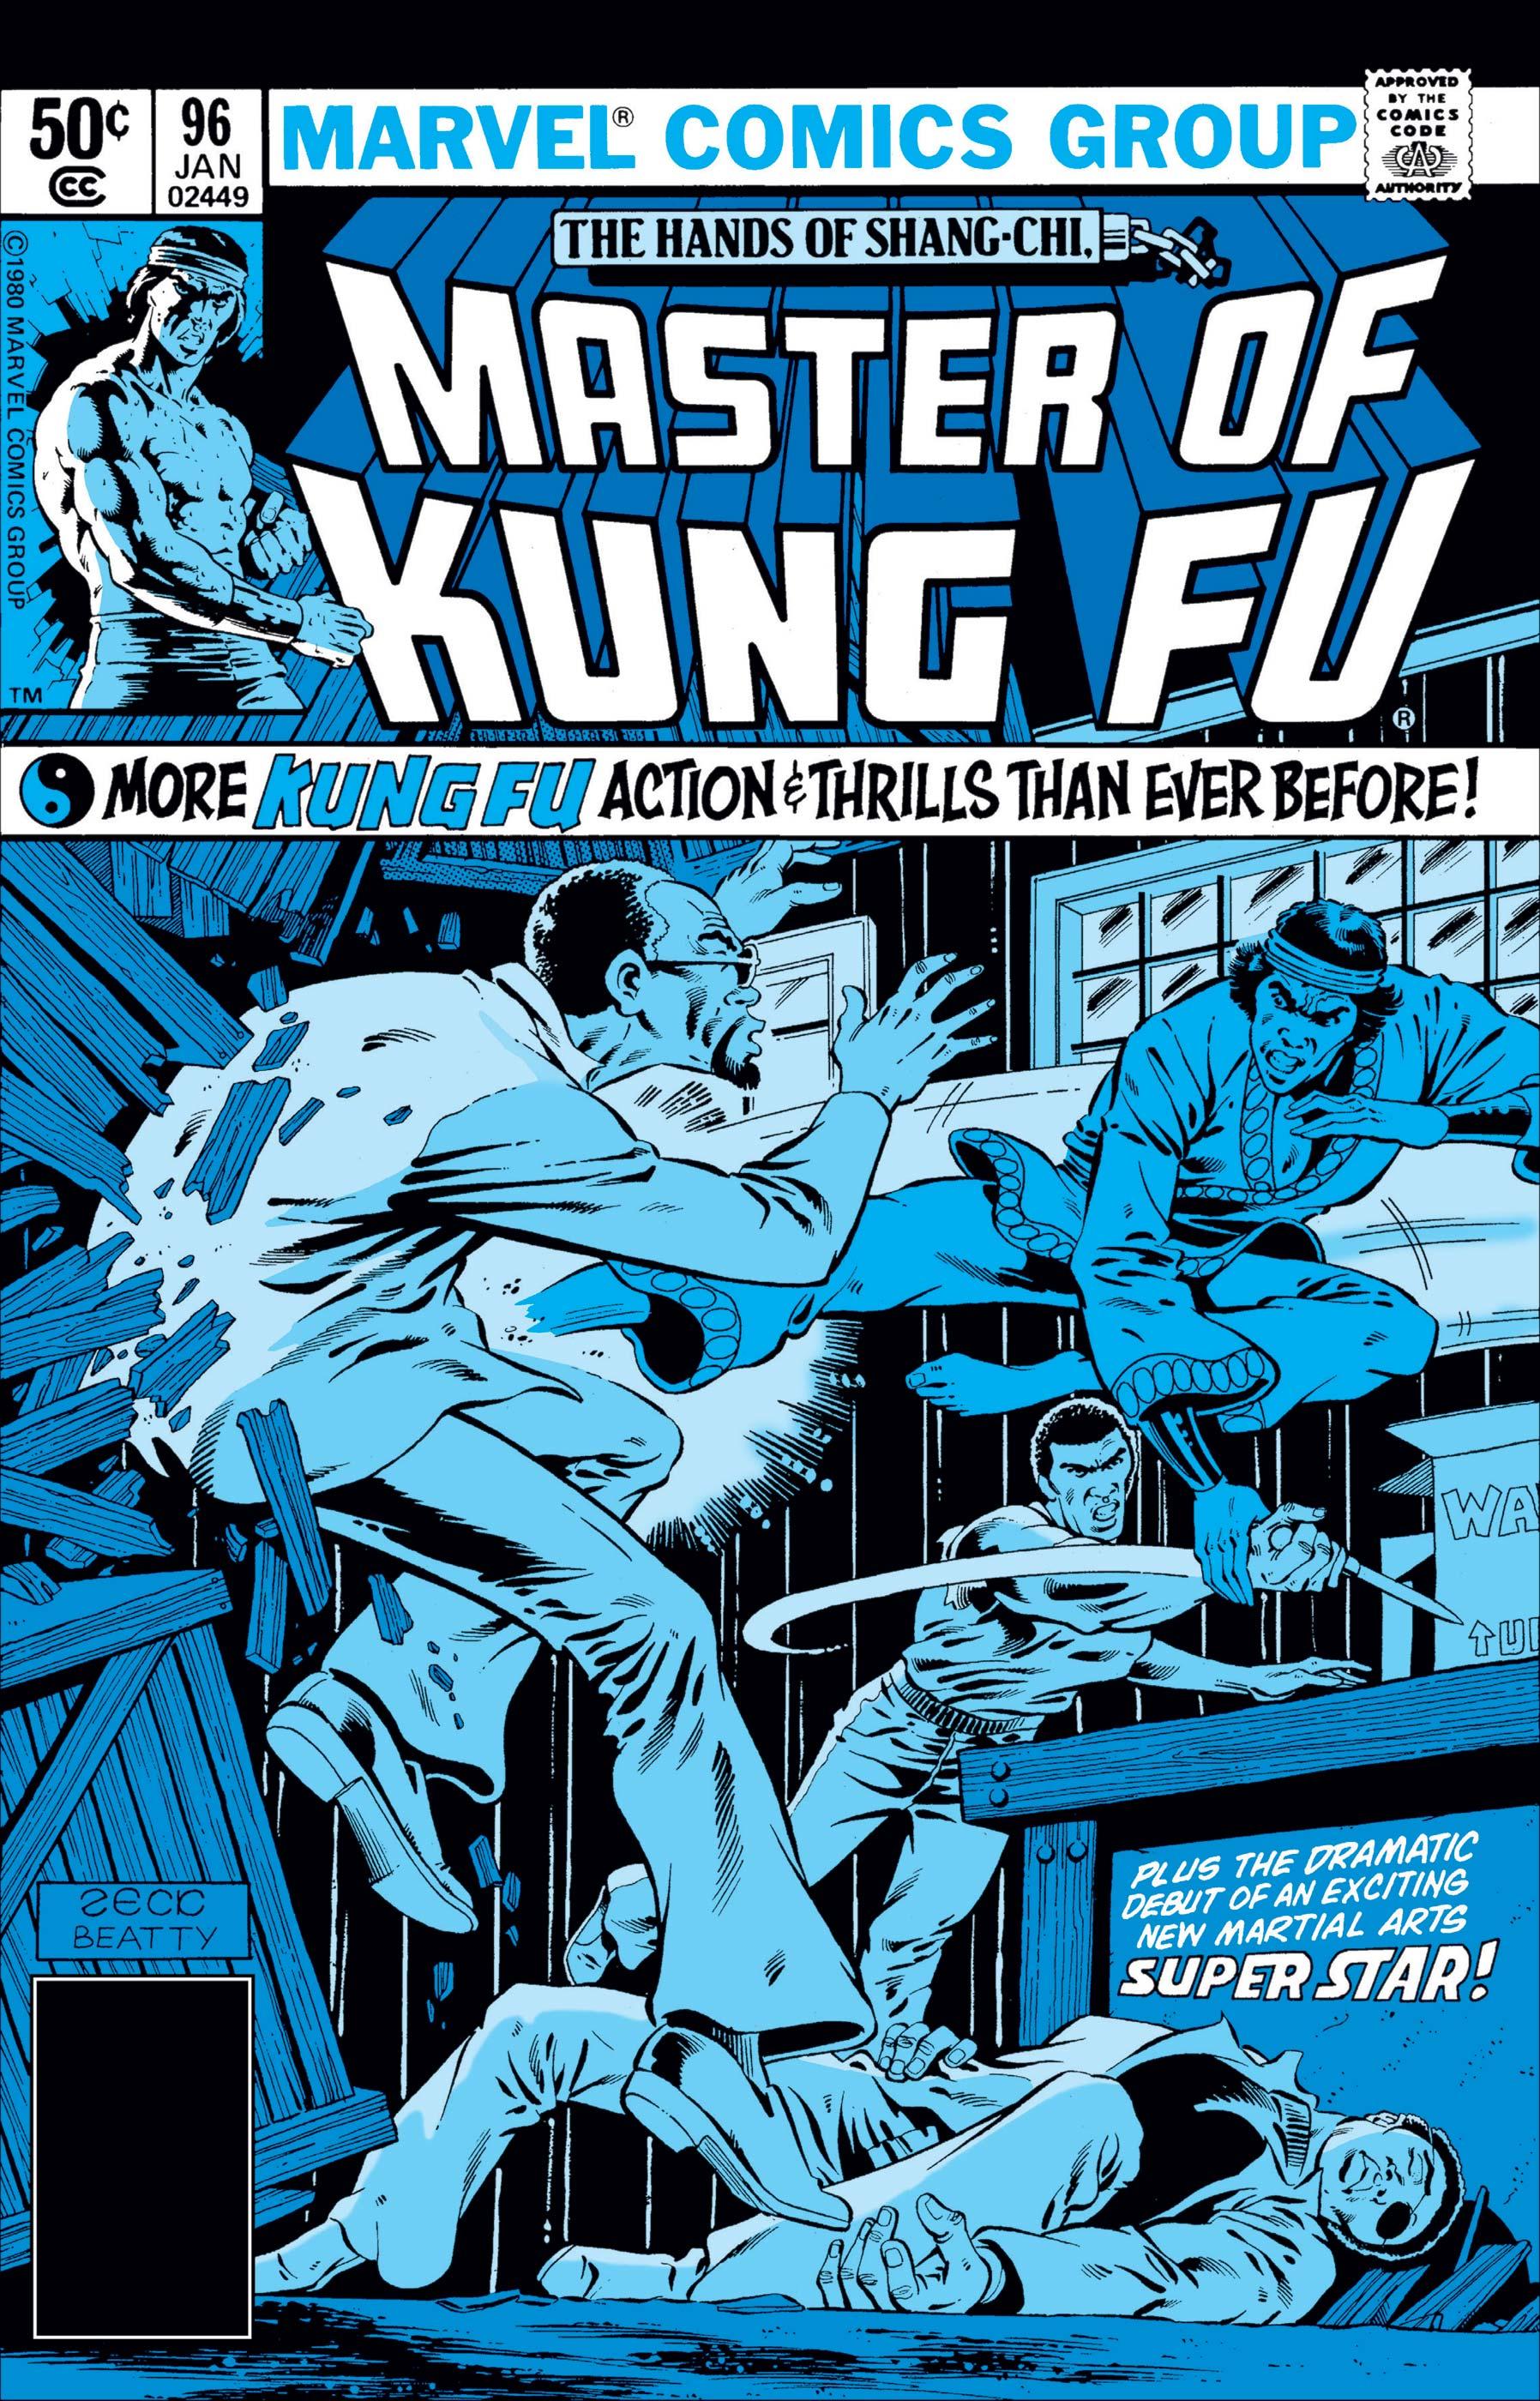 Master of Kung Fu (1974) #96